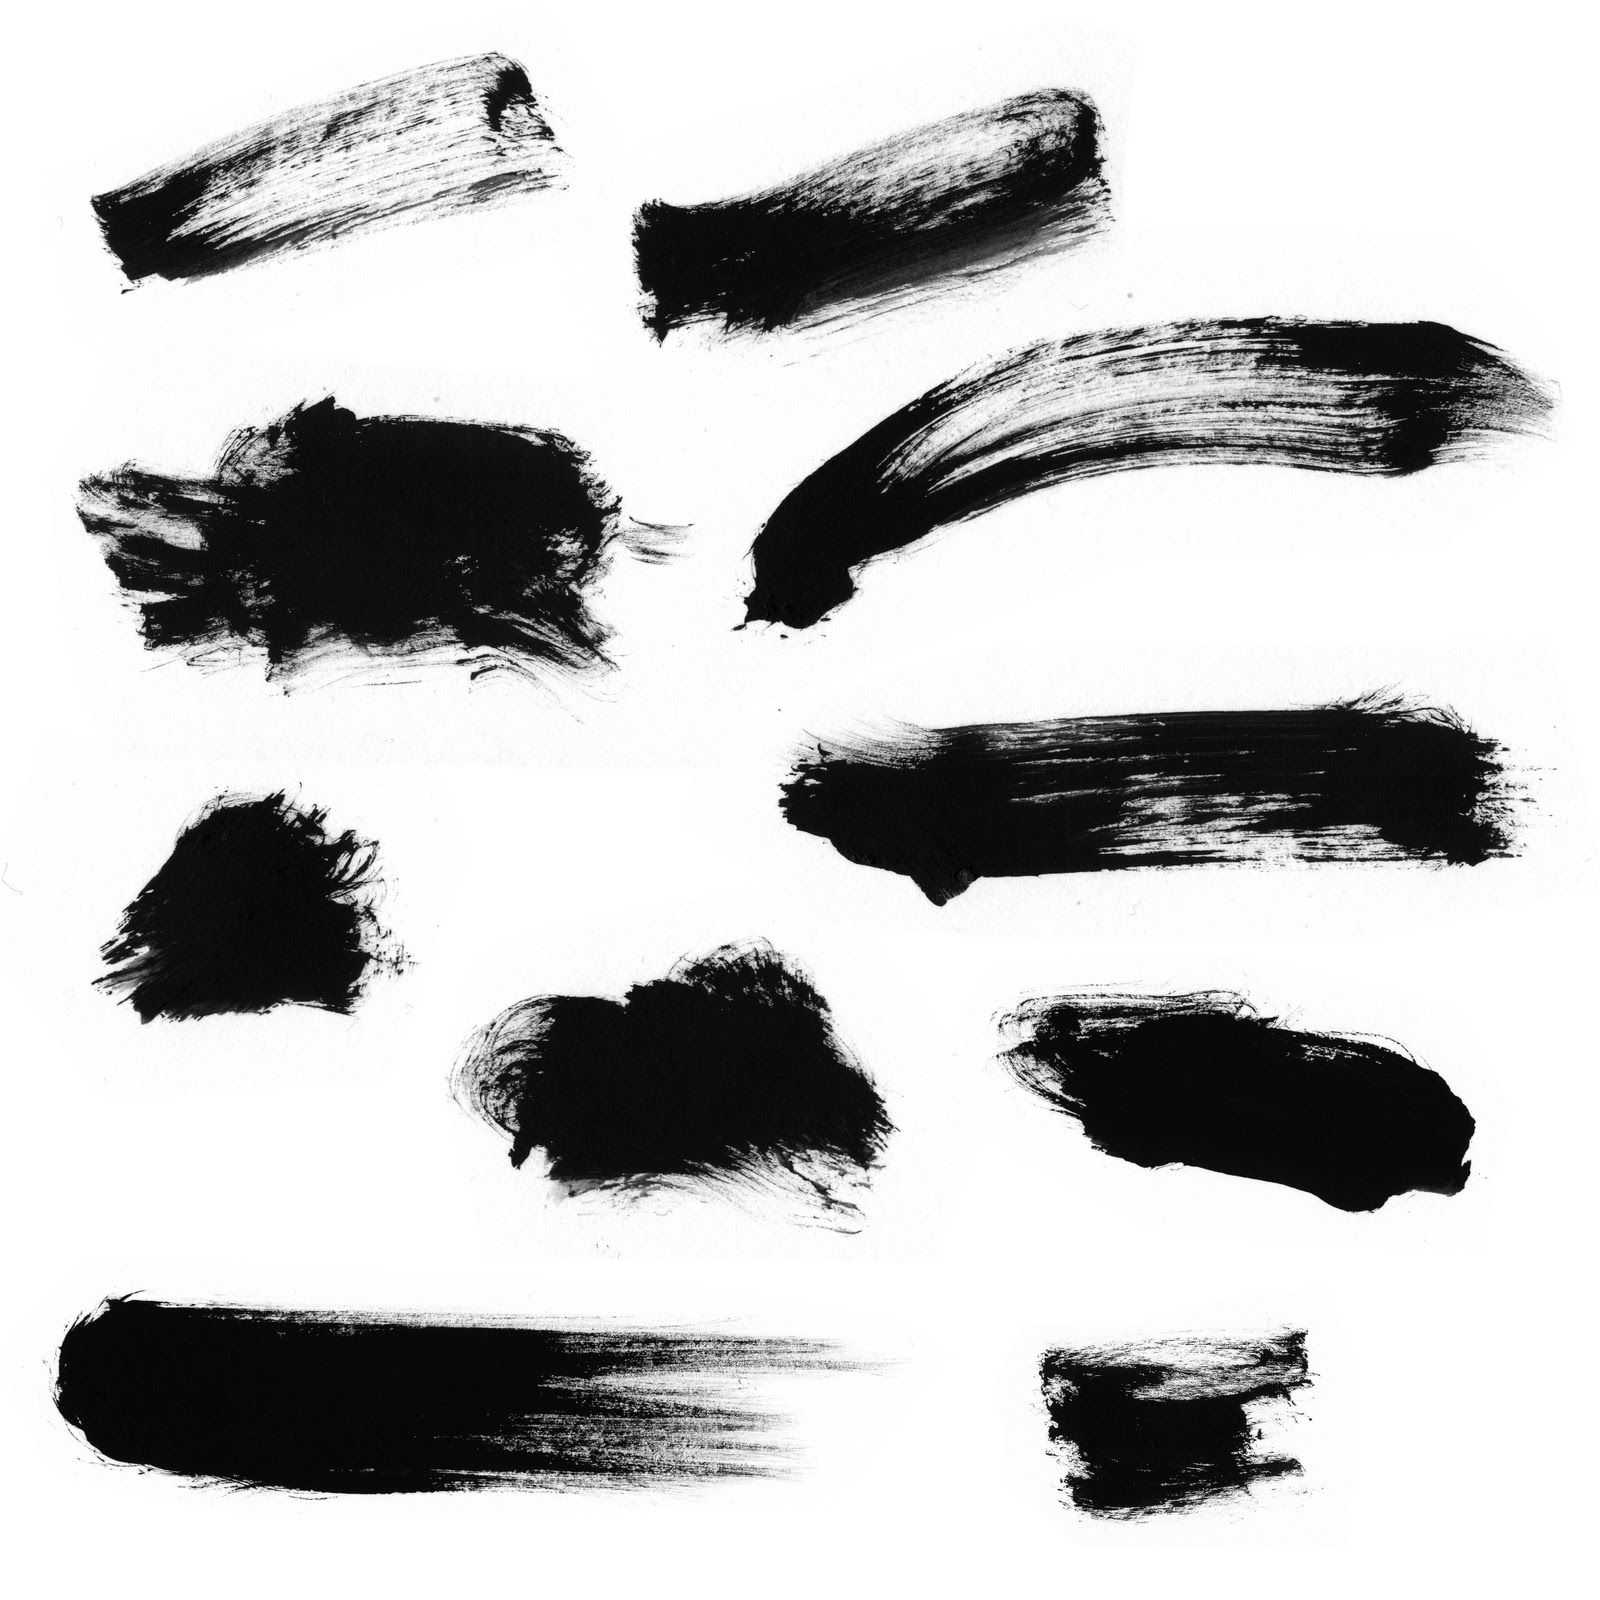 brushstrokes pinterest best brush strokes and psd brushes ideas. Black Bedroom Furniture Sets. Home Design Ideas